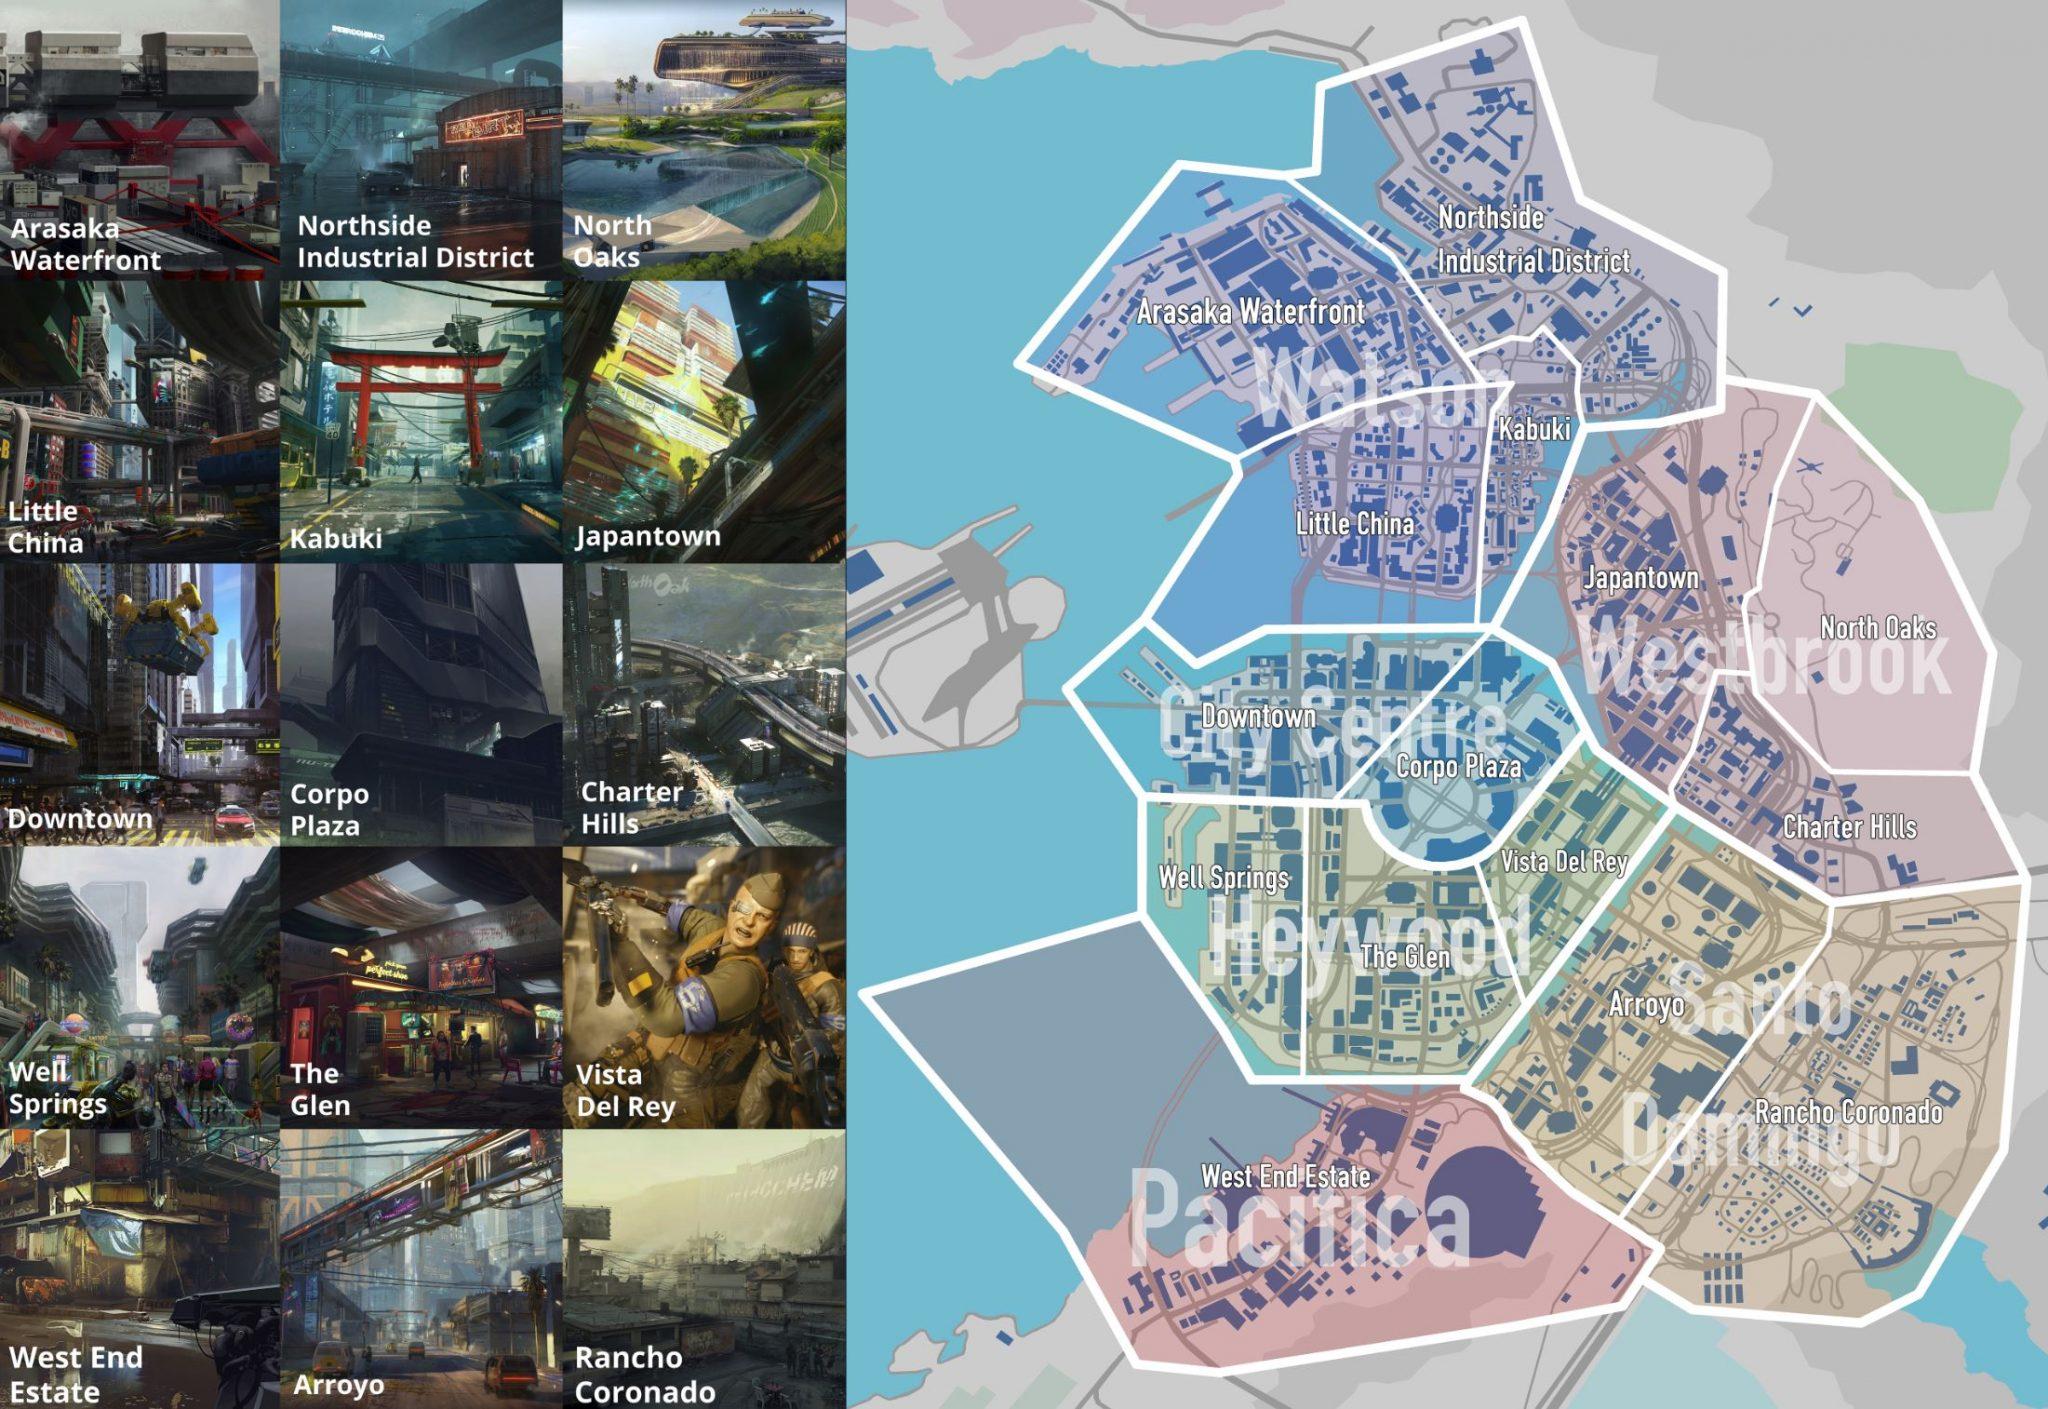 https://www.rocketchainsaw.com.au/wp-content/uploads/2020/07/Cyberpunk-2077-Map-2048x1409.jpg